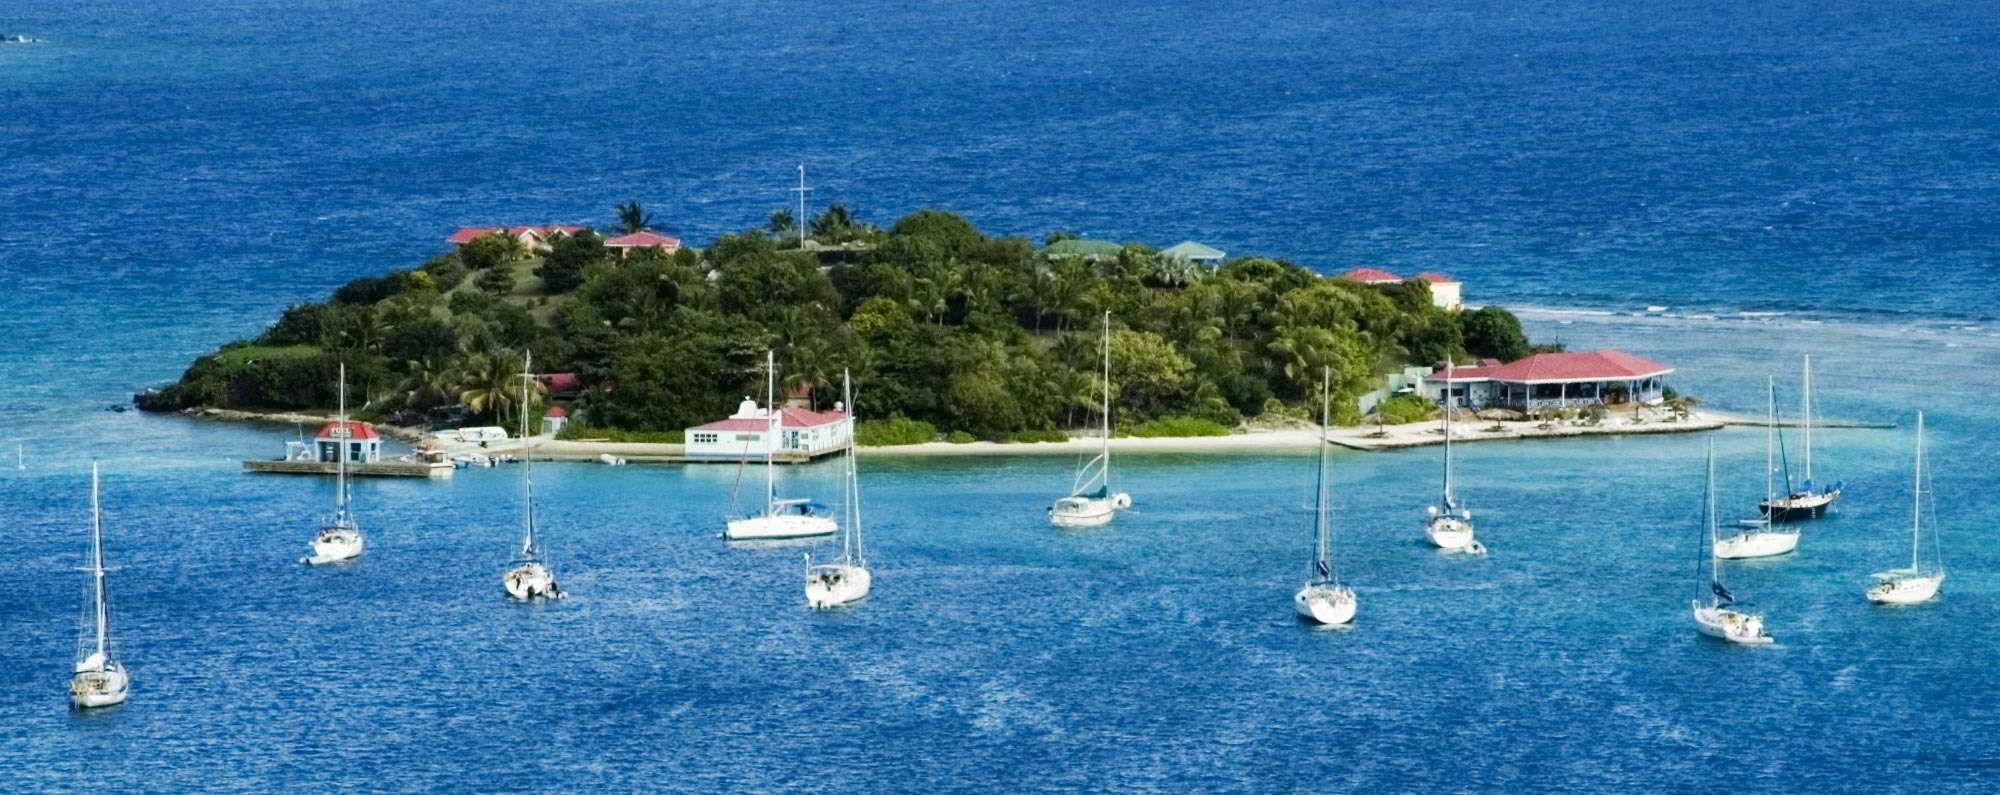 Alquiler de barcos en St. Martin